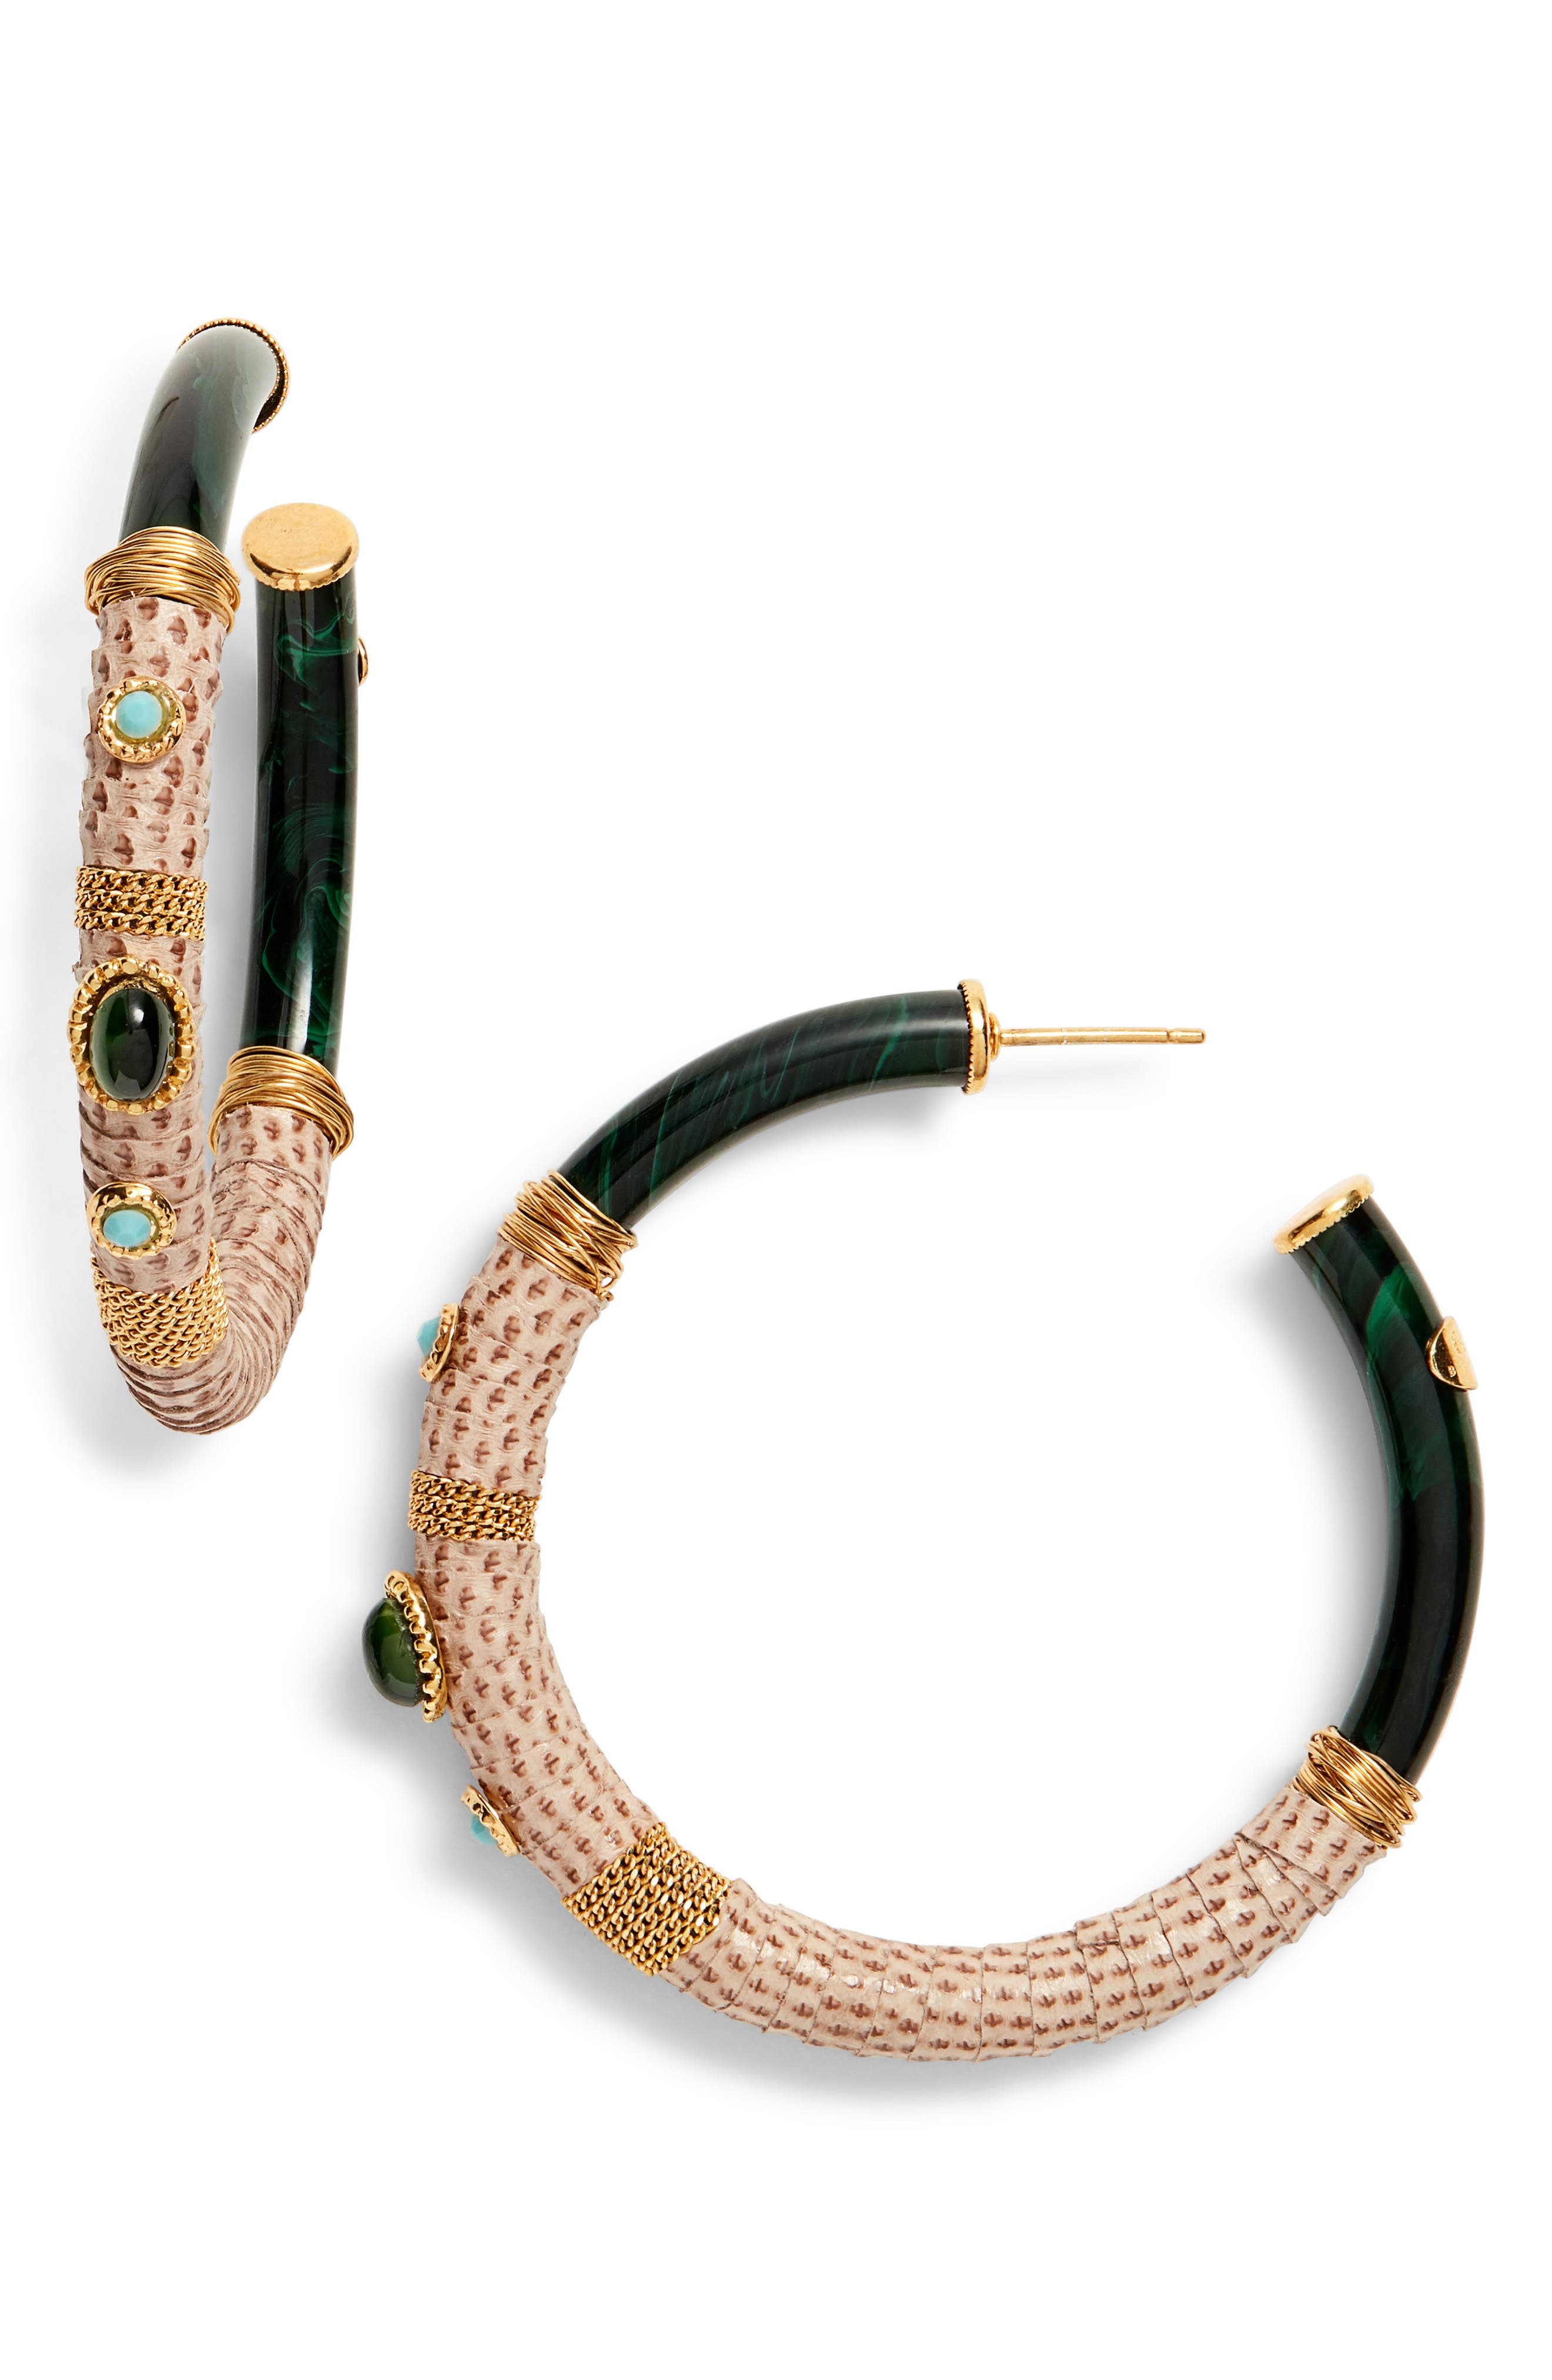 Comporta Genuine Snakeskin Wrapped Hoop Earrings,                             Main thumbnail 1, color,                             PURPLE